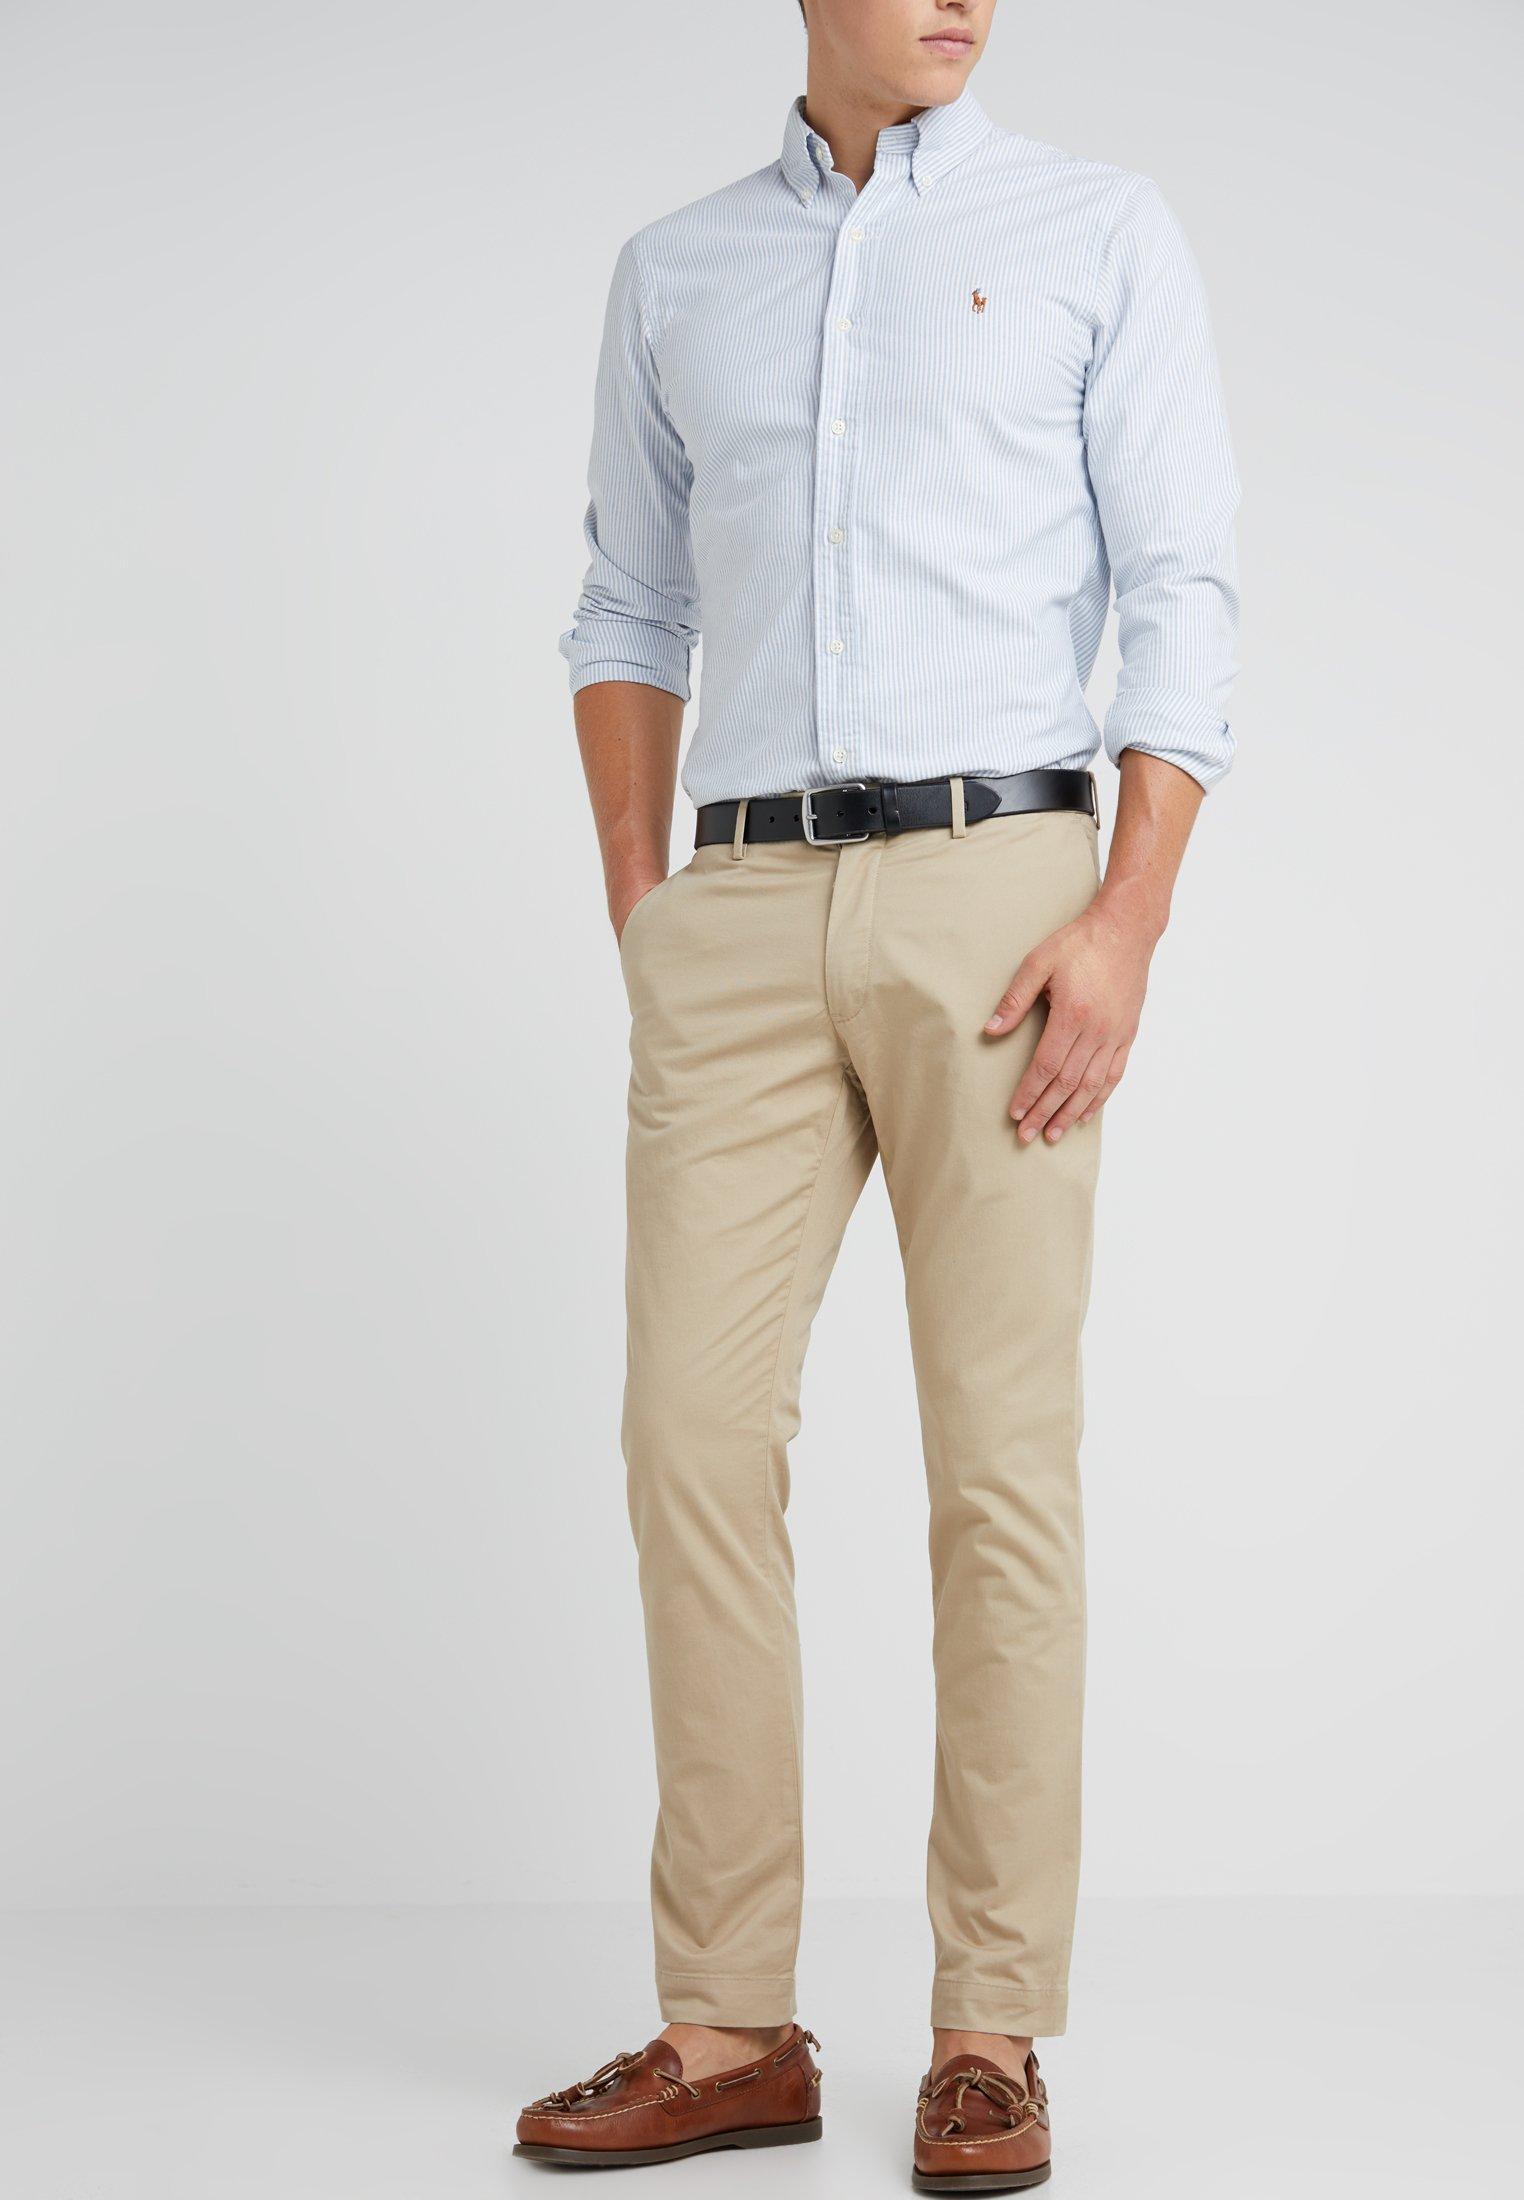 Polo Ralph Lauren Flat Pant Trousers Classic Khaki Khaki Zalando Co Uk